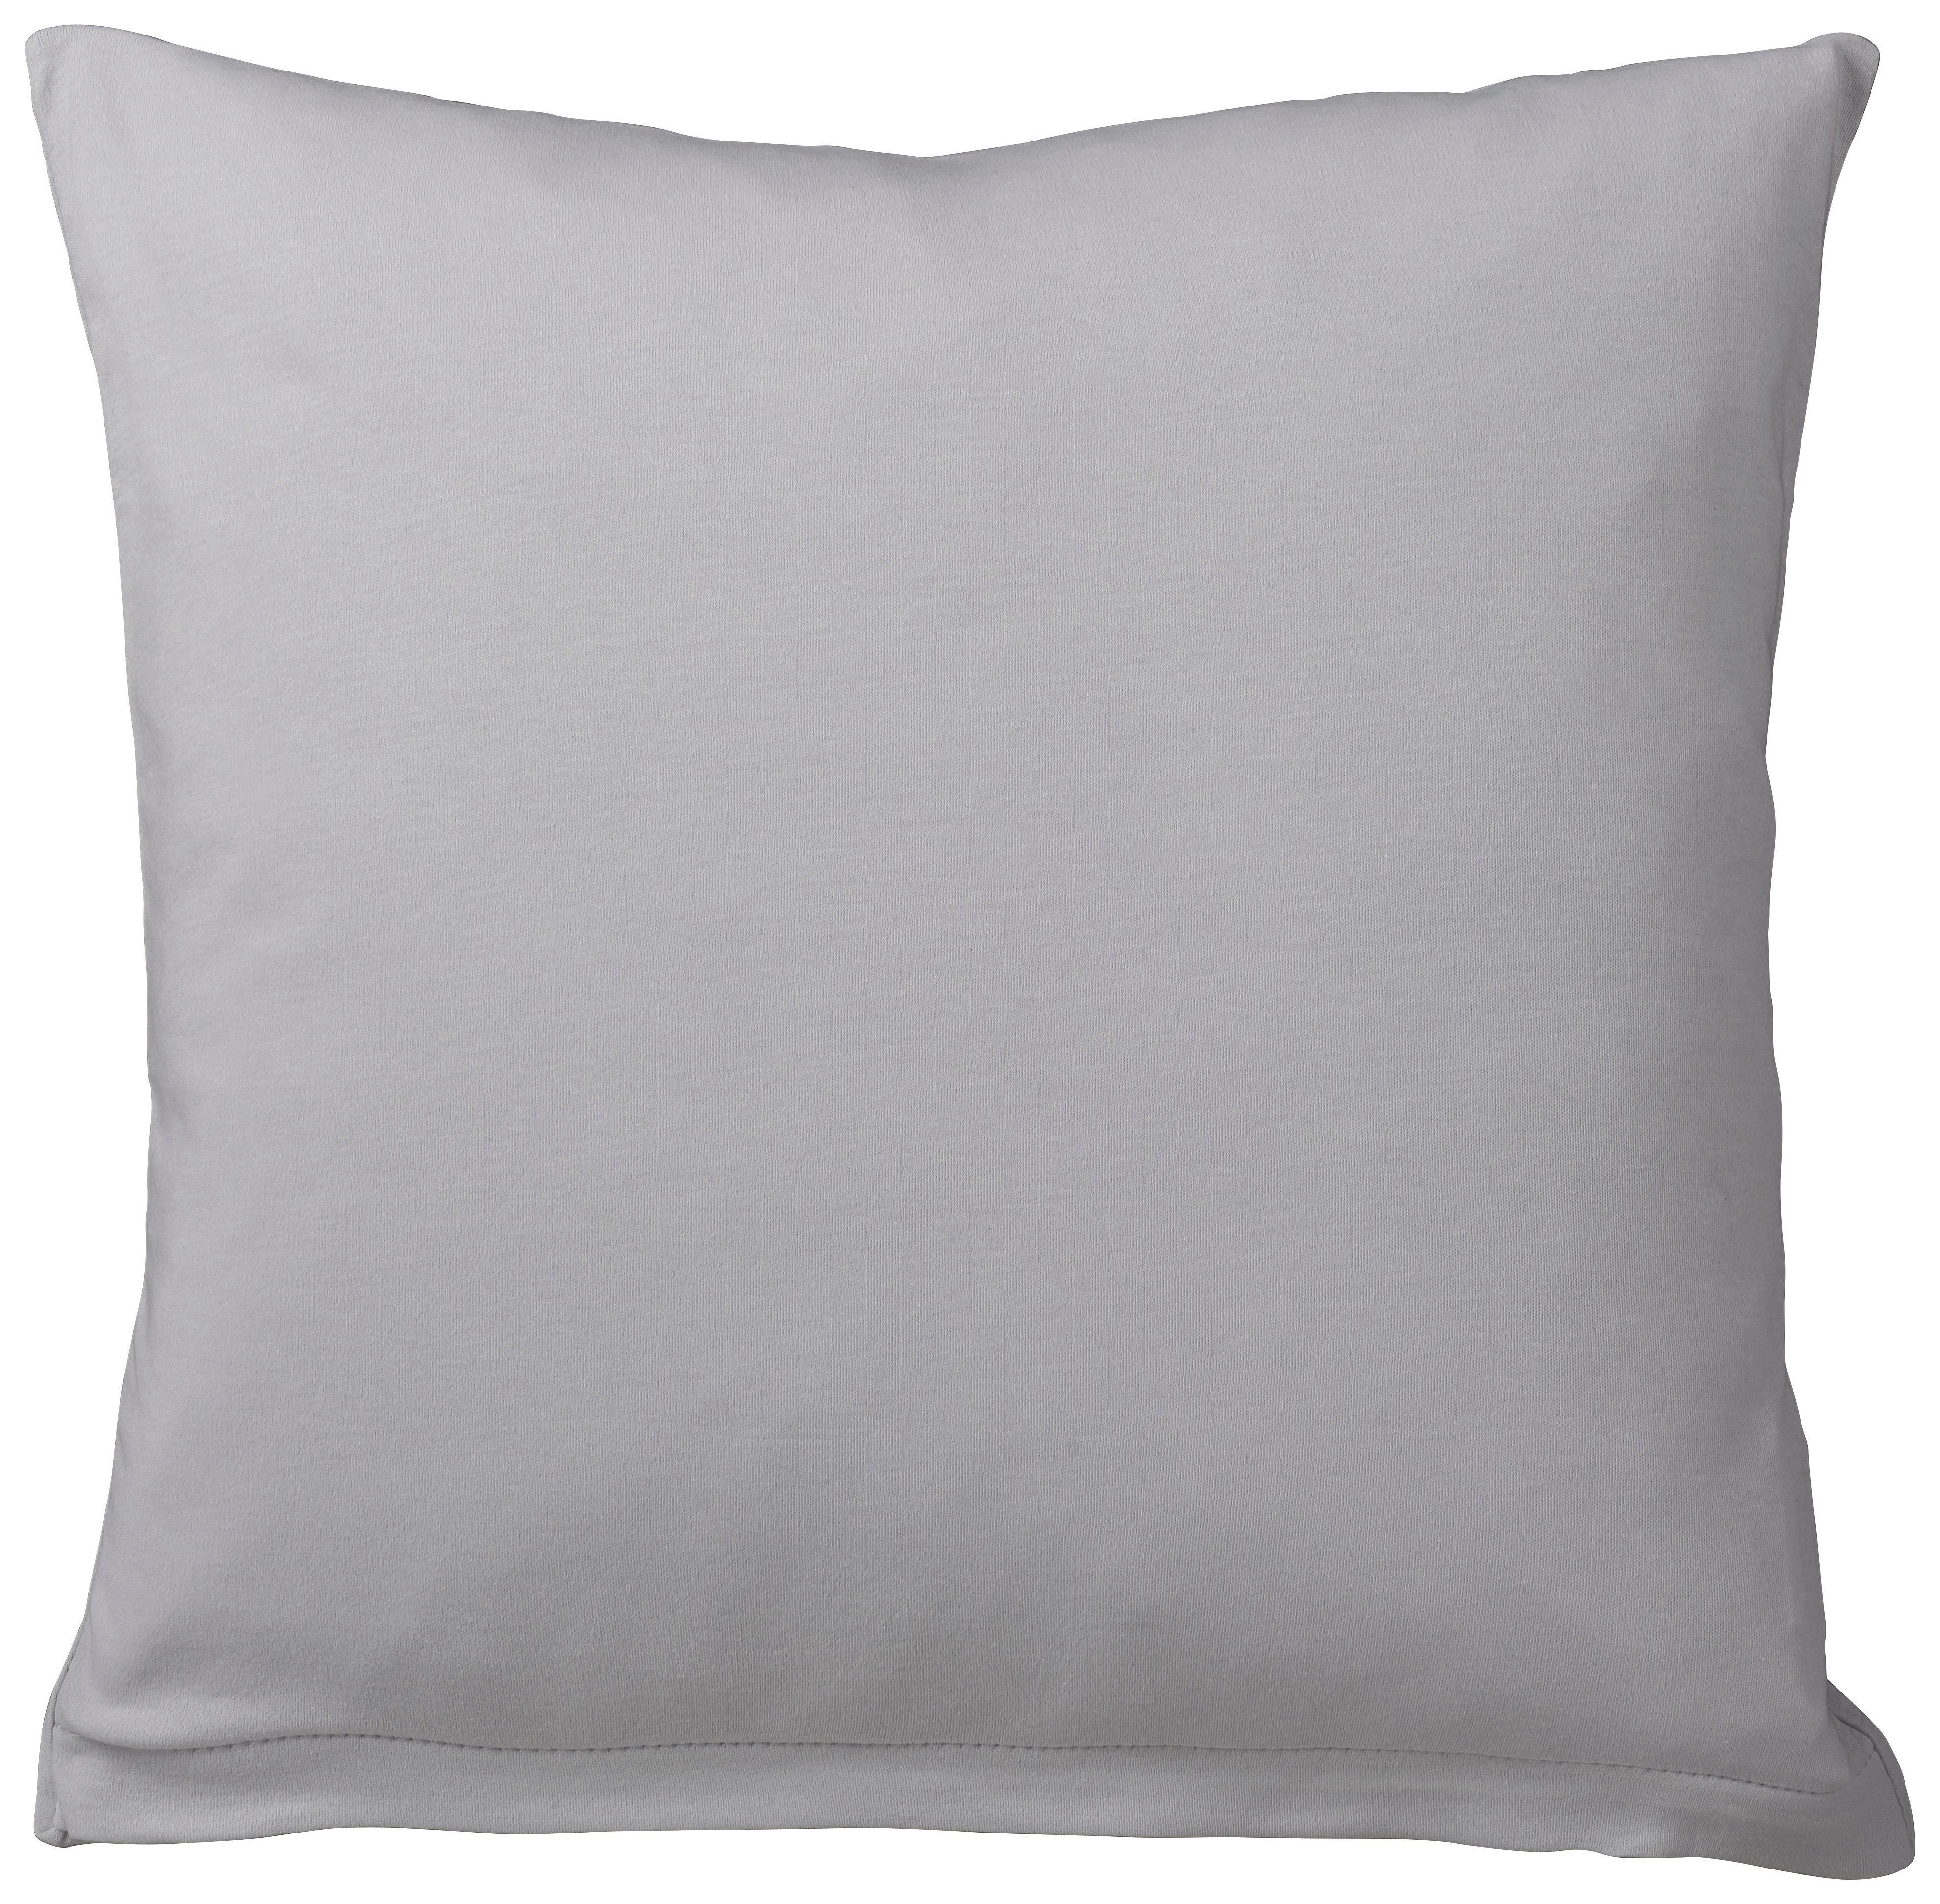 KISSENHÜLLE Hellgrau 80/80 cm - Hellgrau, Basics, Textil (80/80cm) - SCHLAFGUT